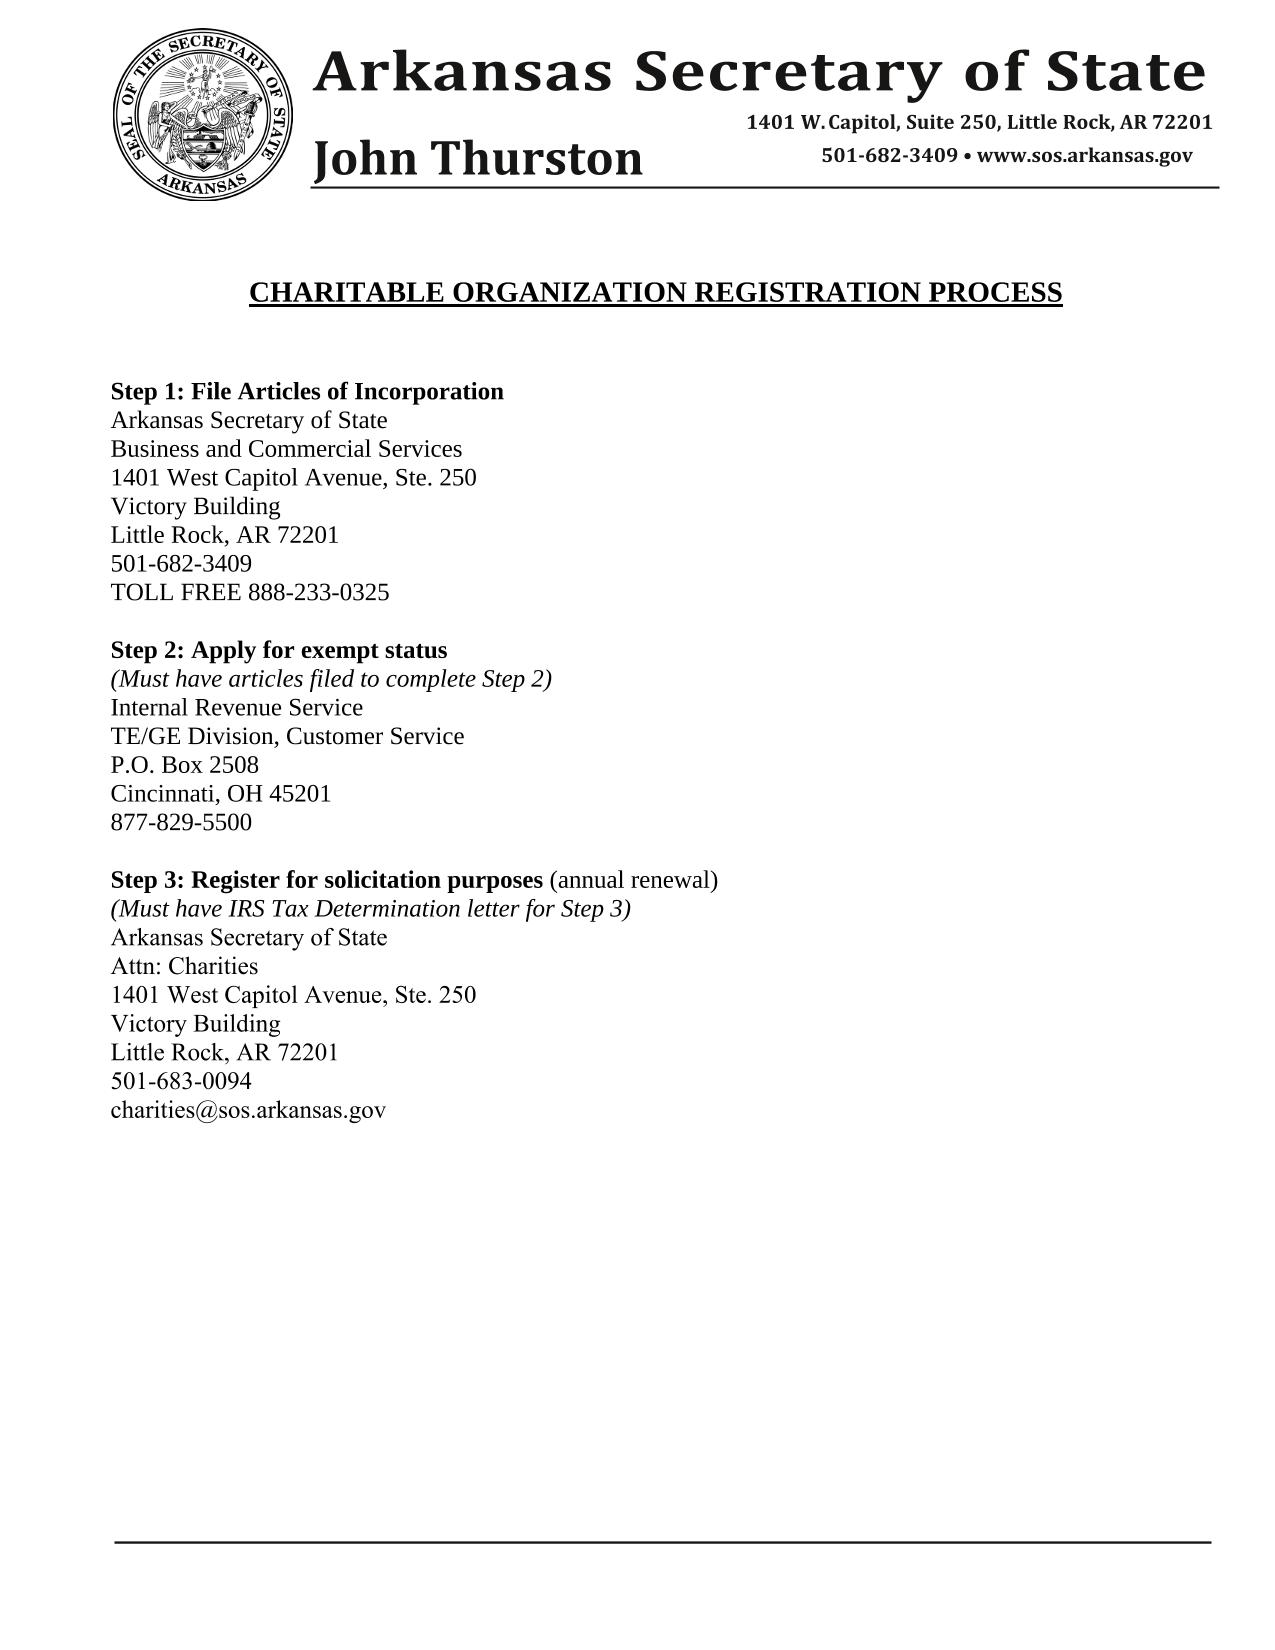 Arkansas Articles of Incorporation - Domestic Nonprofit